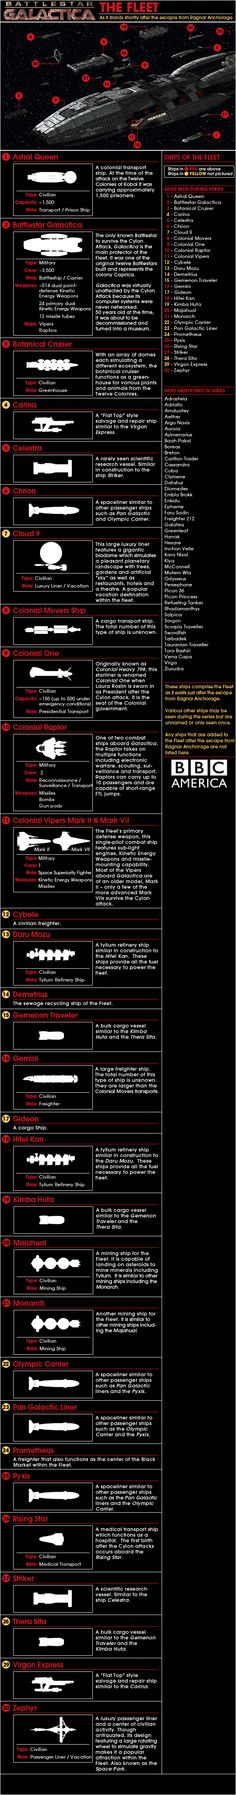 Battlestar Galactica Infographic: Ships of the Colonial Fleet #battlestargalactica #ragtagfugitivefleet #ronaldbmoore